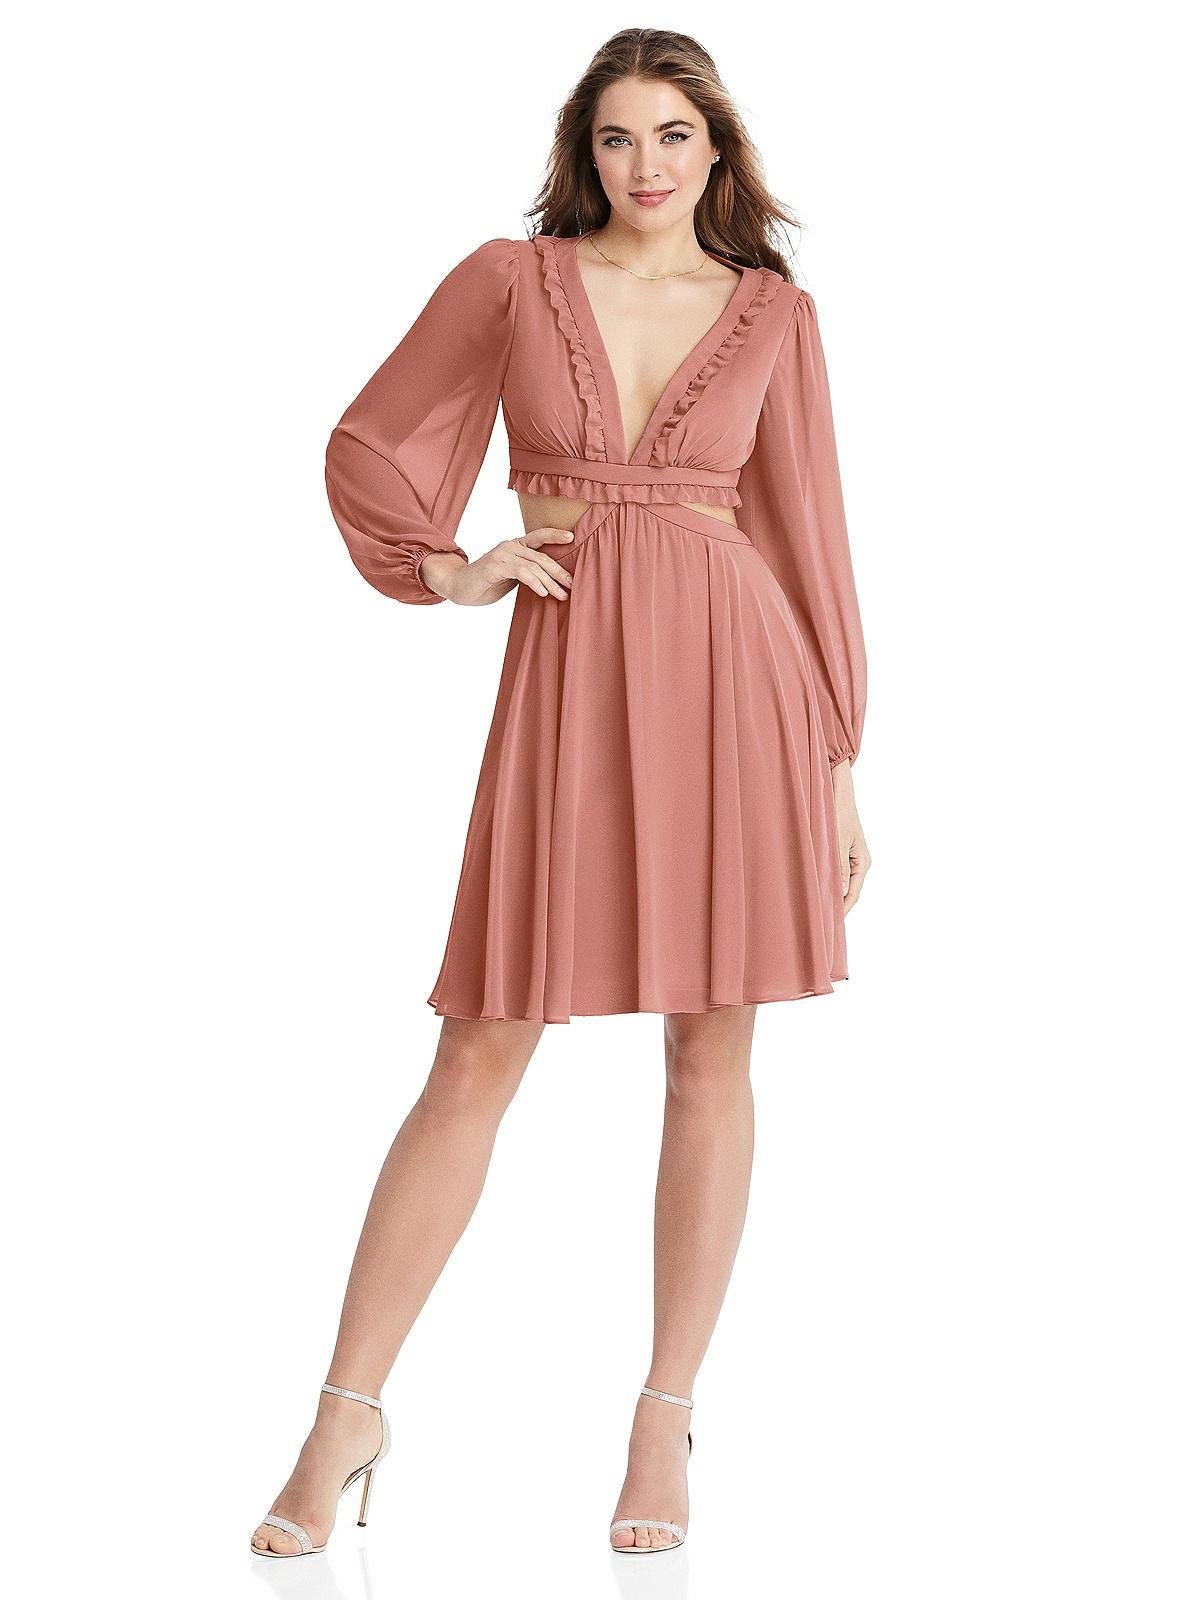 Special Order Bishop Sleeve Ruffled Chiffon Cutout Mini Dress - Hannah